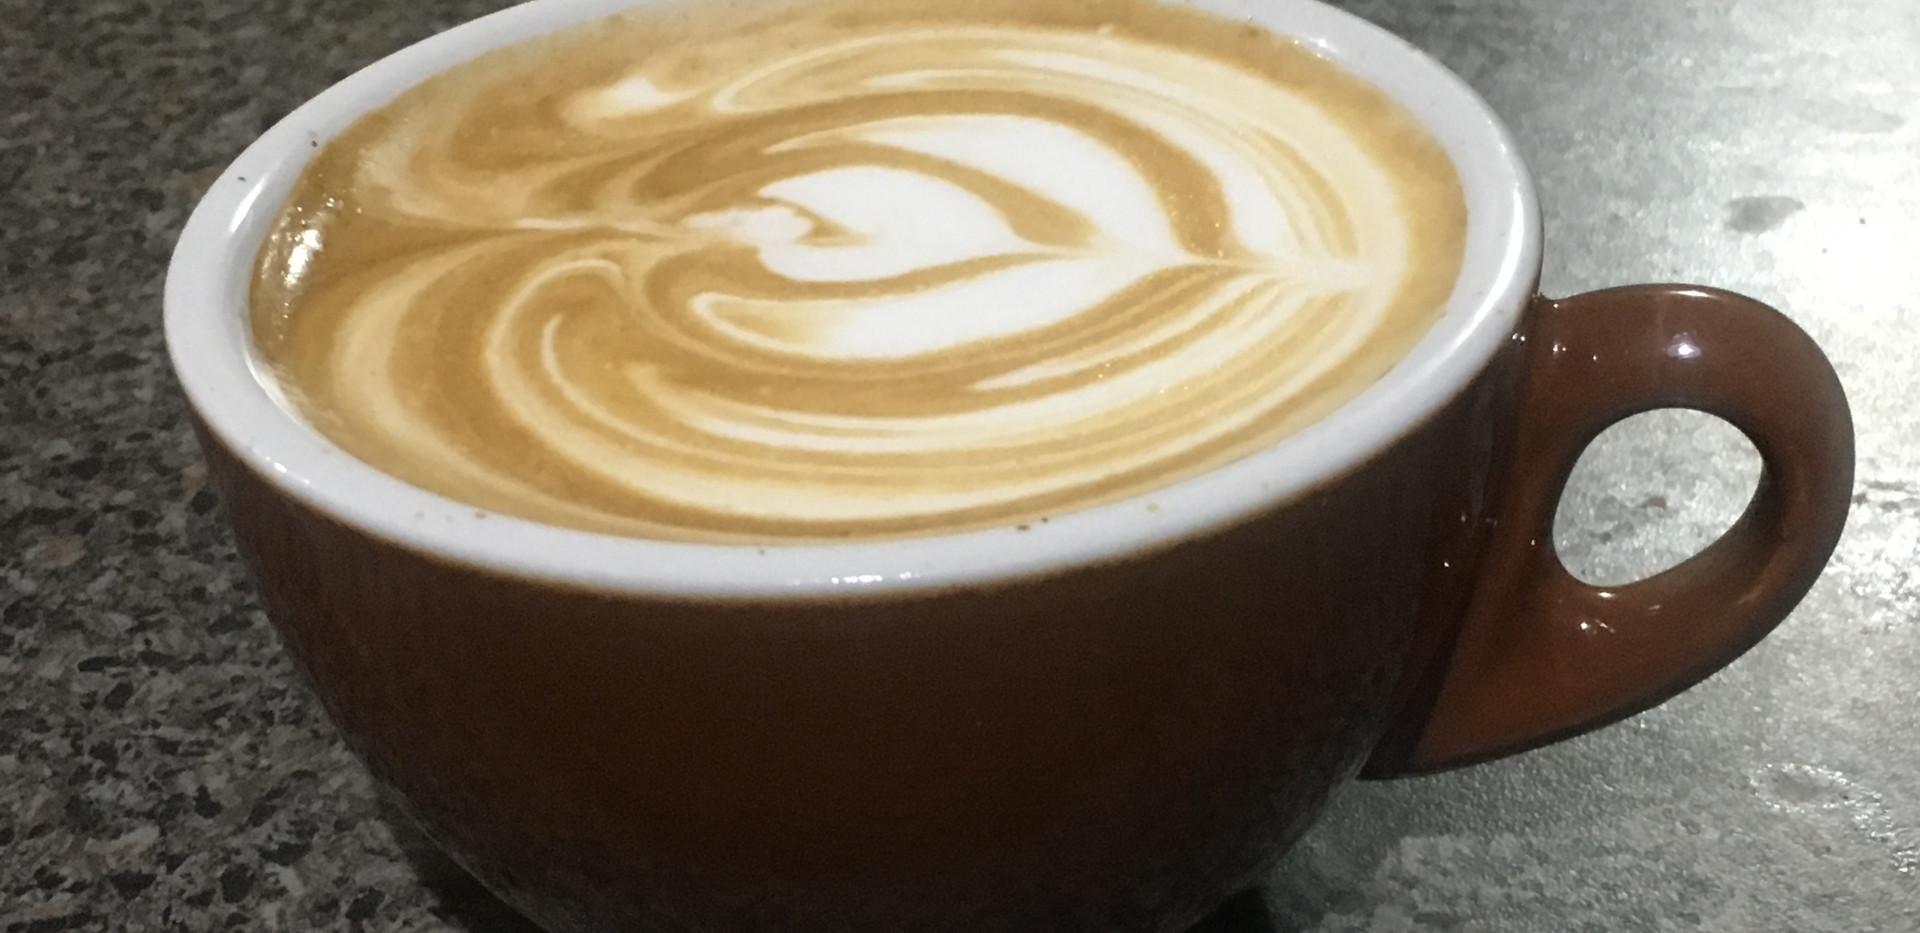 Coffee training - make the perfect flat